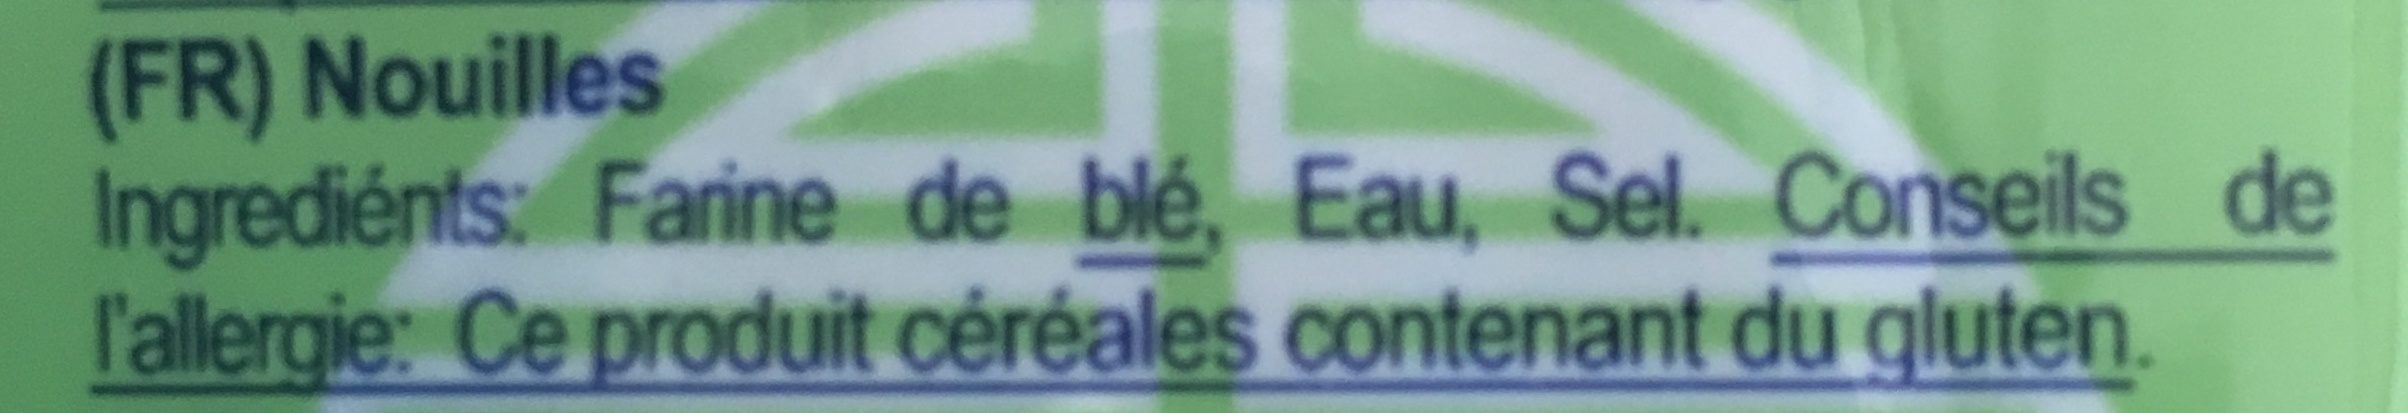 Nouilles De Blé Séchées - Ingrediënten